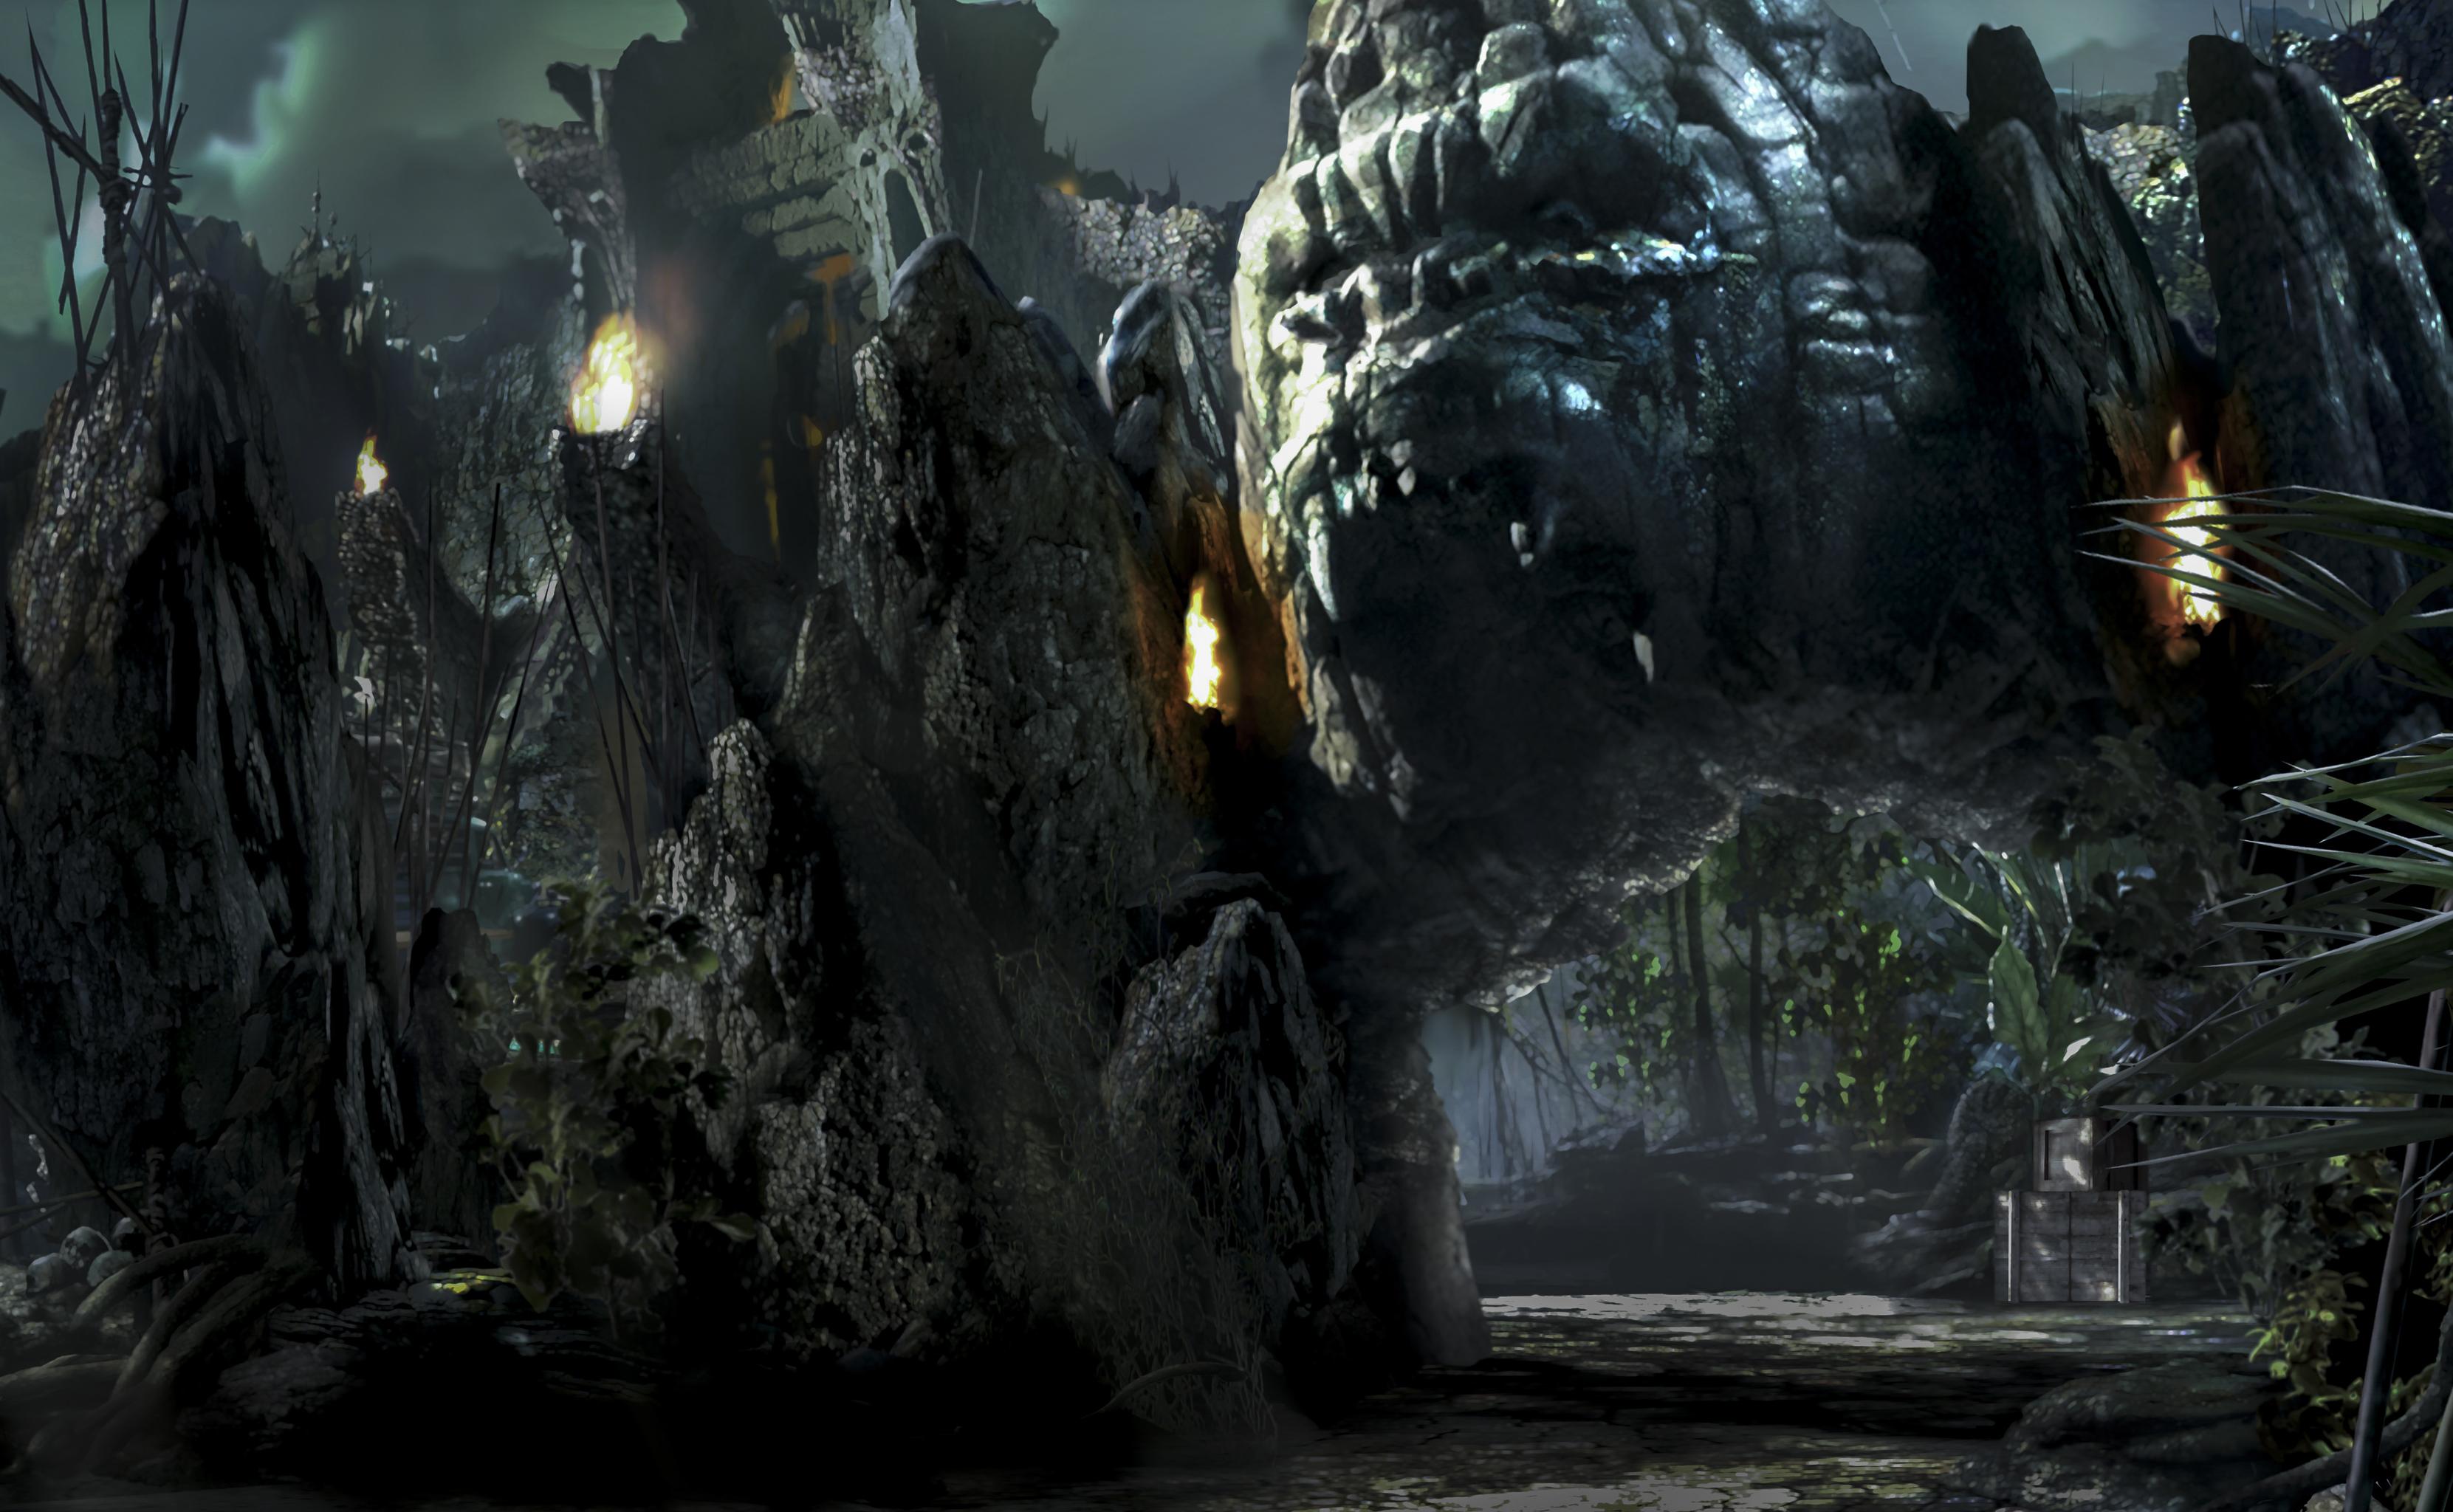 King Kong confirmed for Universal Orlando